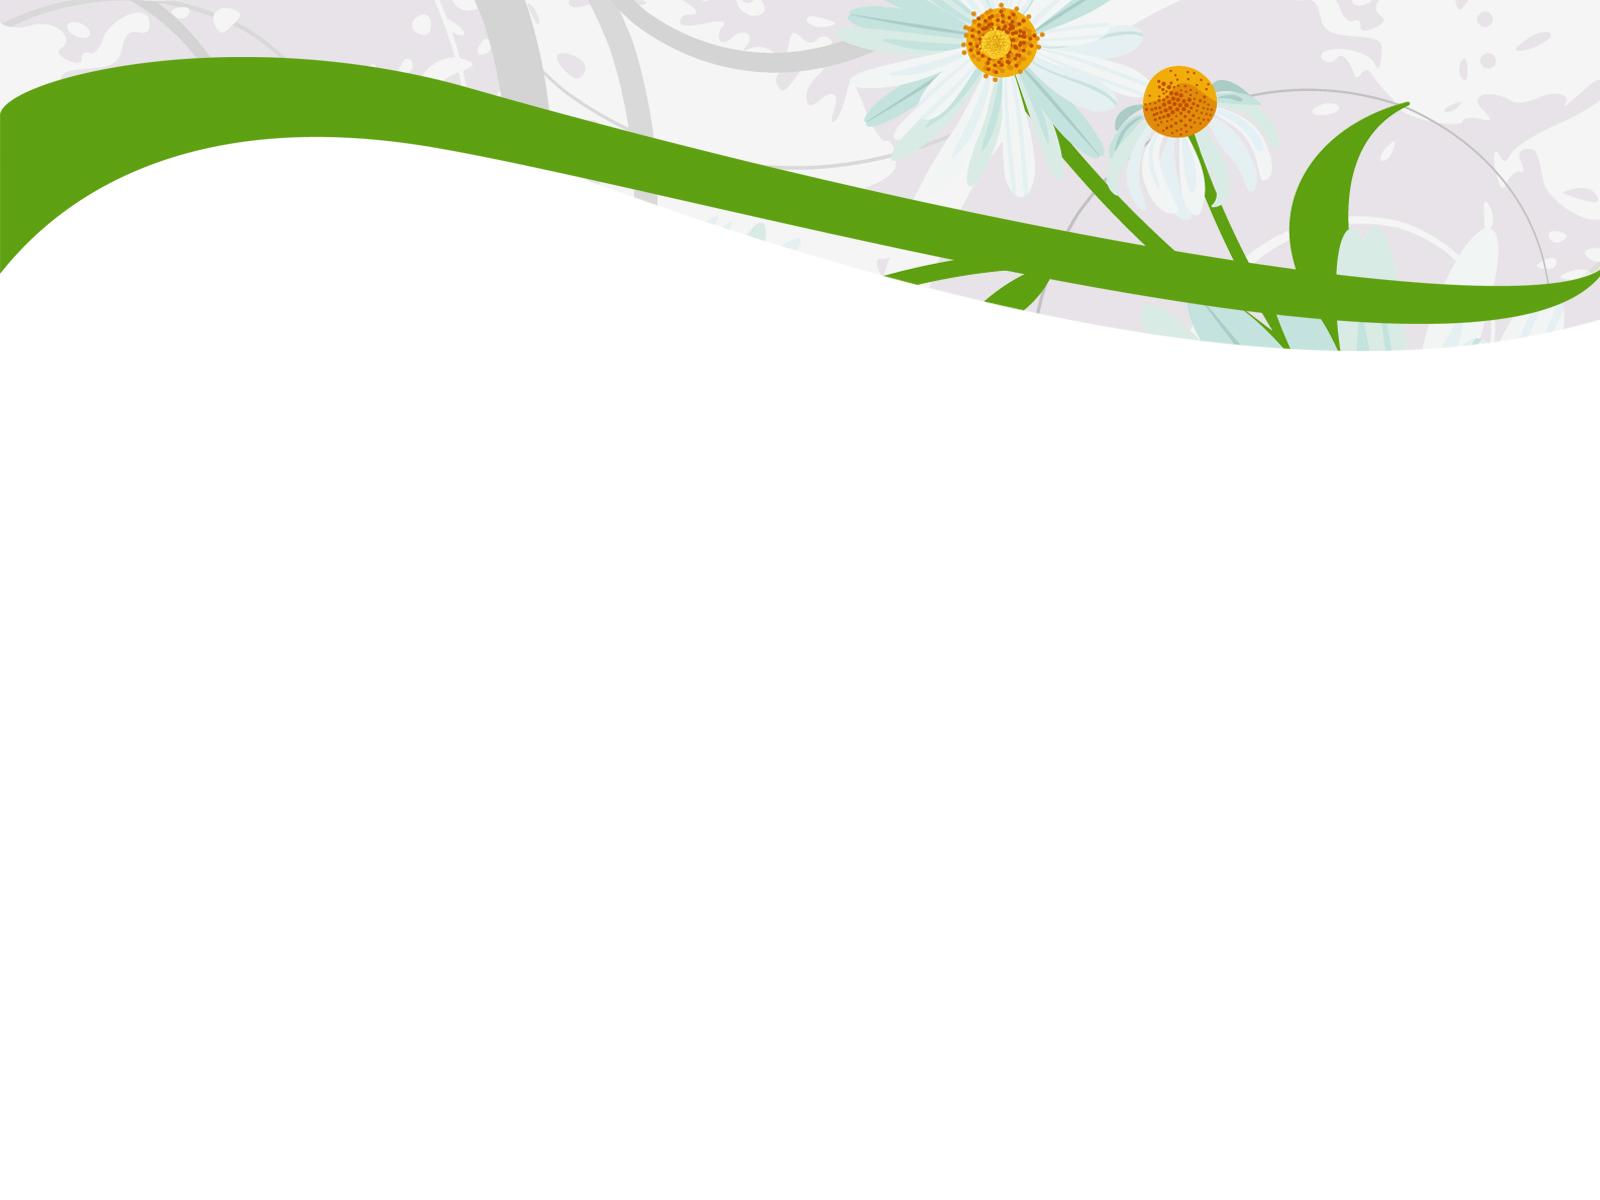 Hình nền Powerpoint hoa đẹp nhất 1